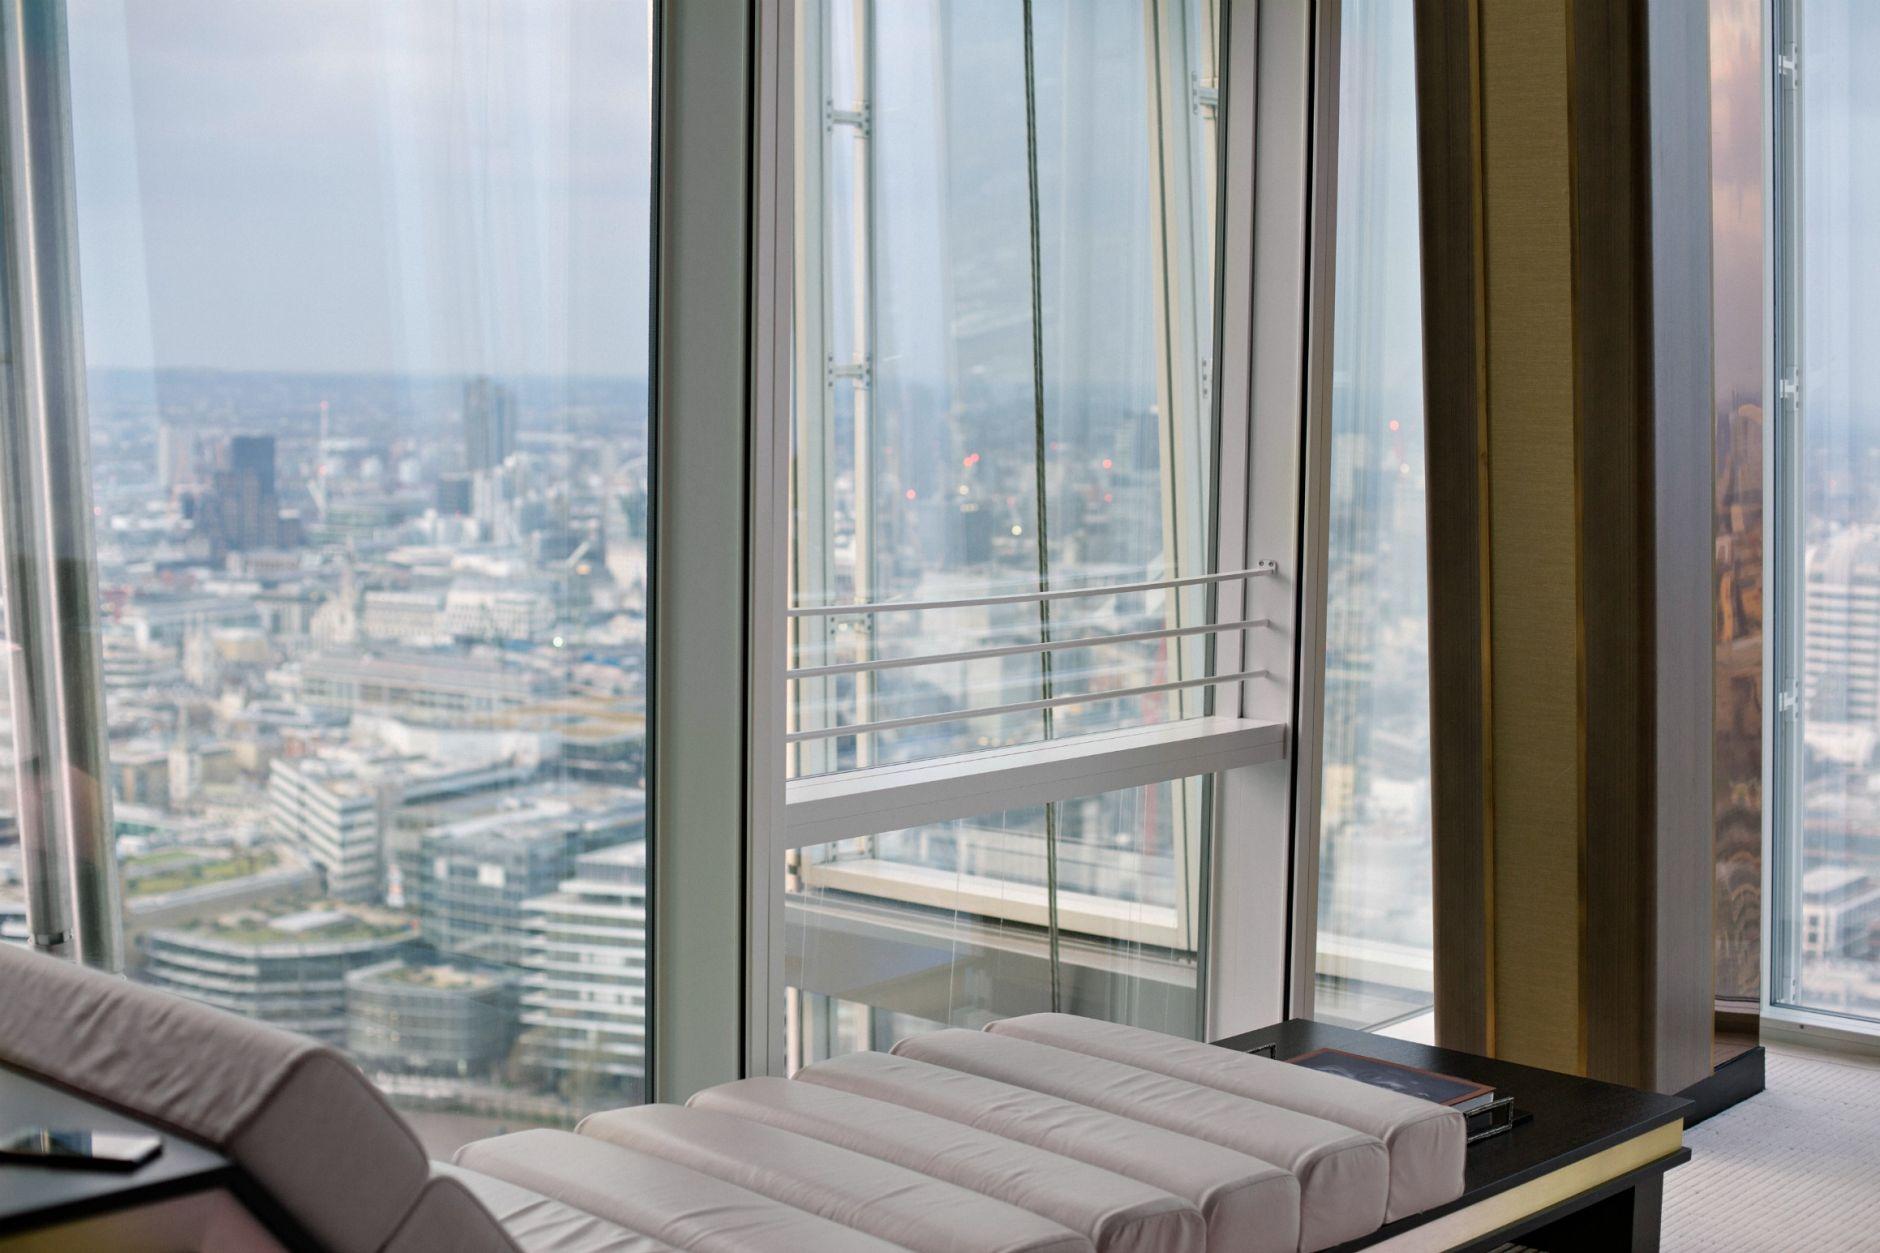 disi-couture-travel-shangri-la-hotel-shard-london-tower-bridge-england-edisa-shahini-02